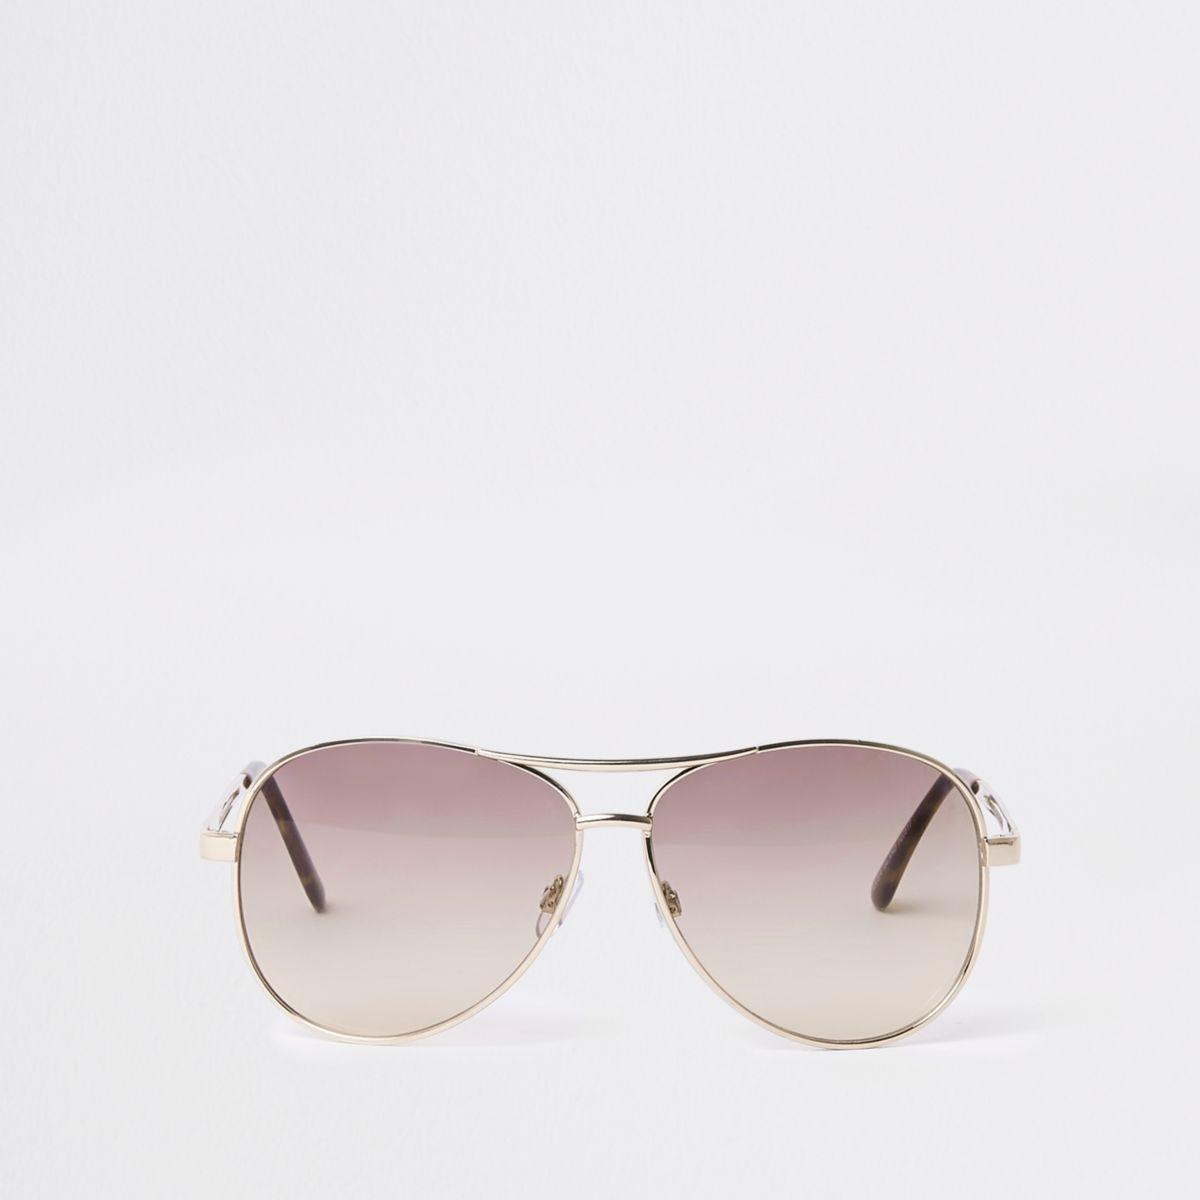 Gold tone smoke lens aviator style sunglasses